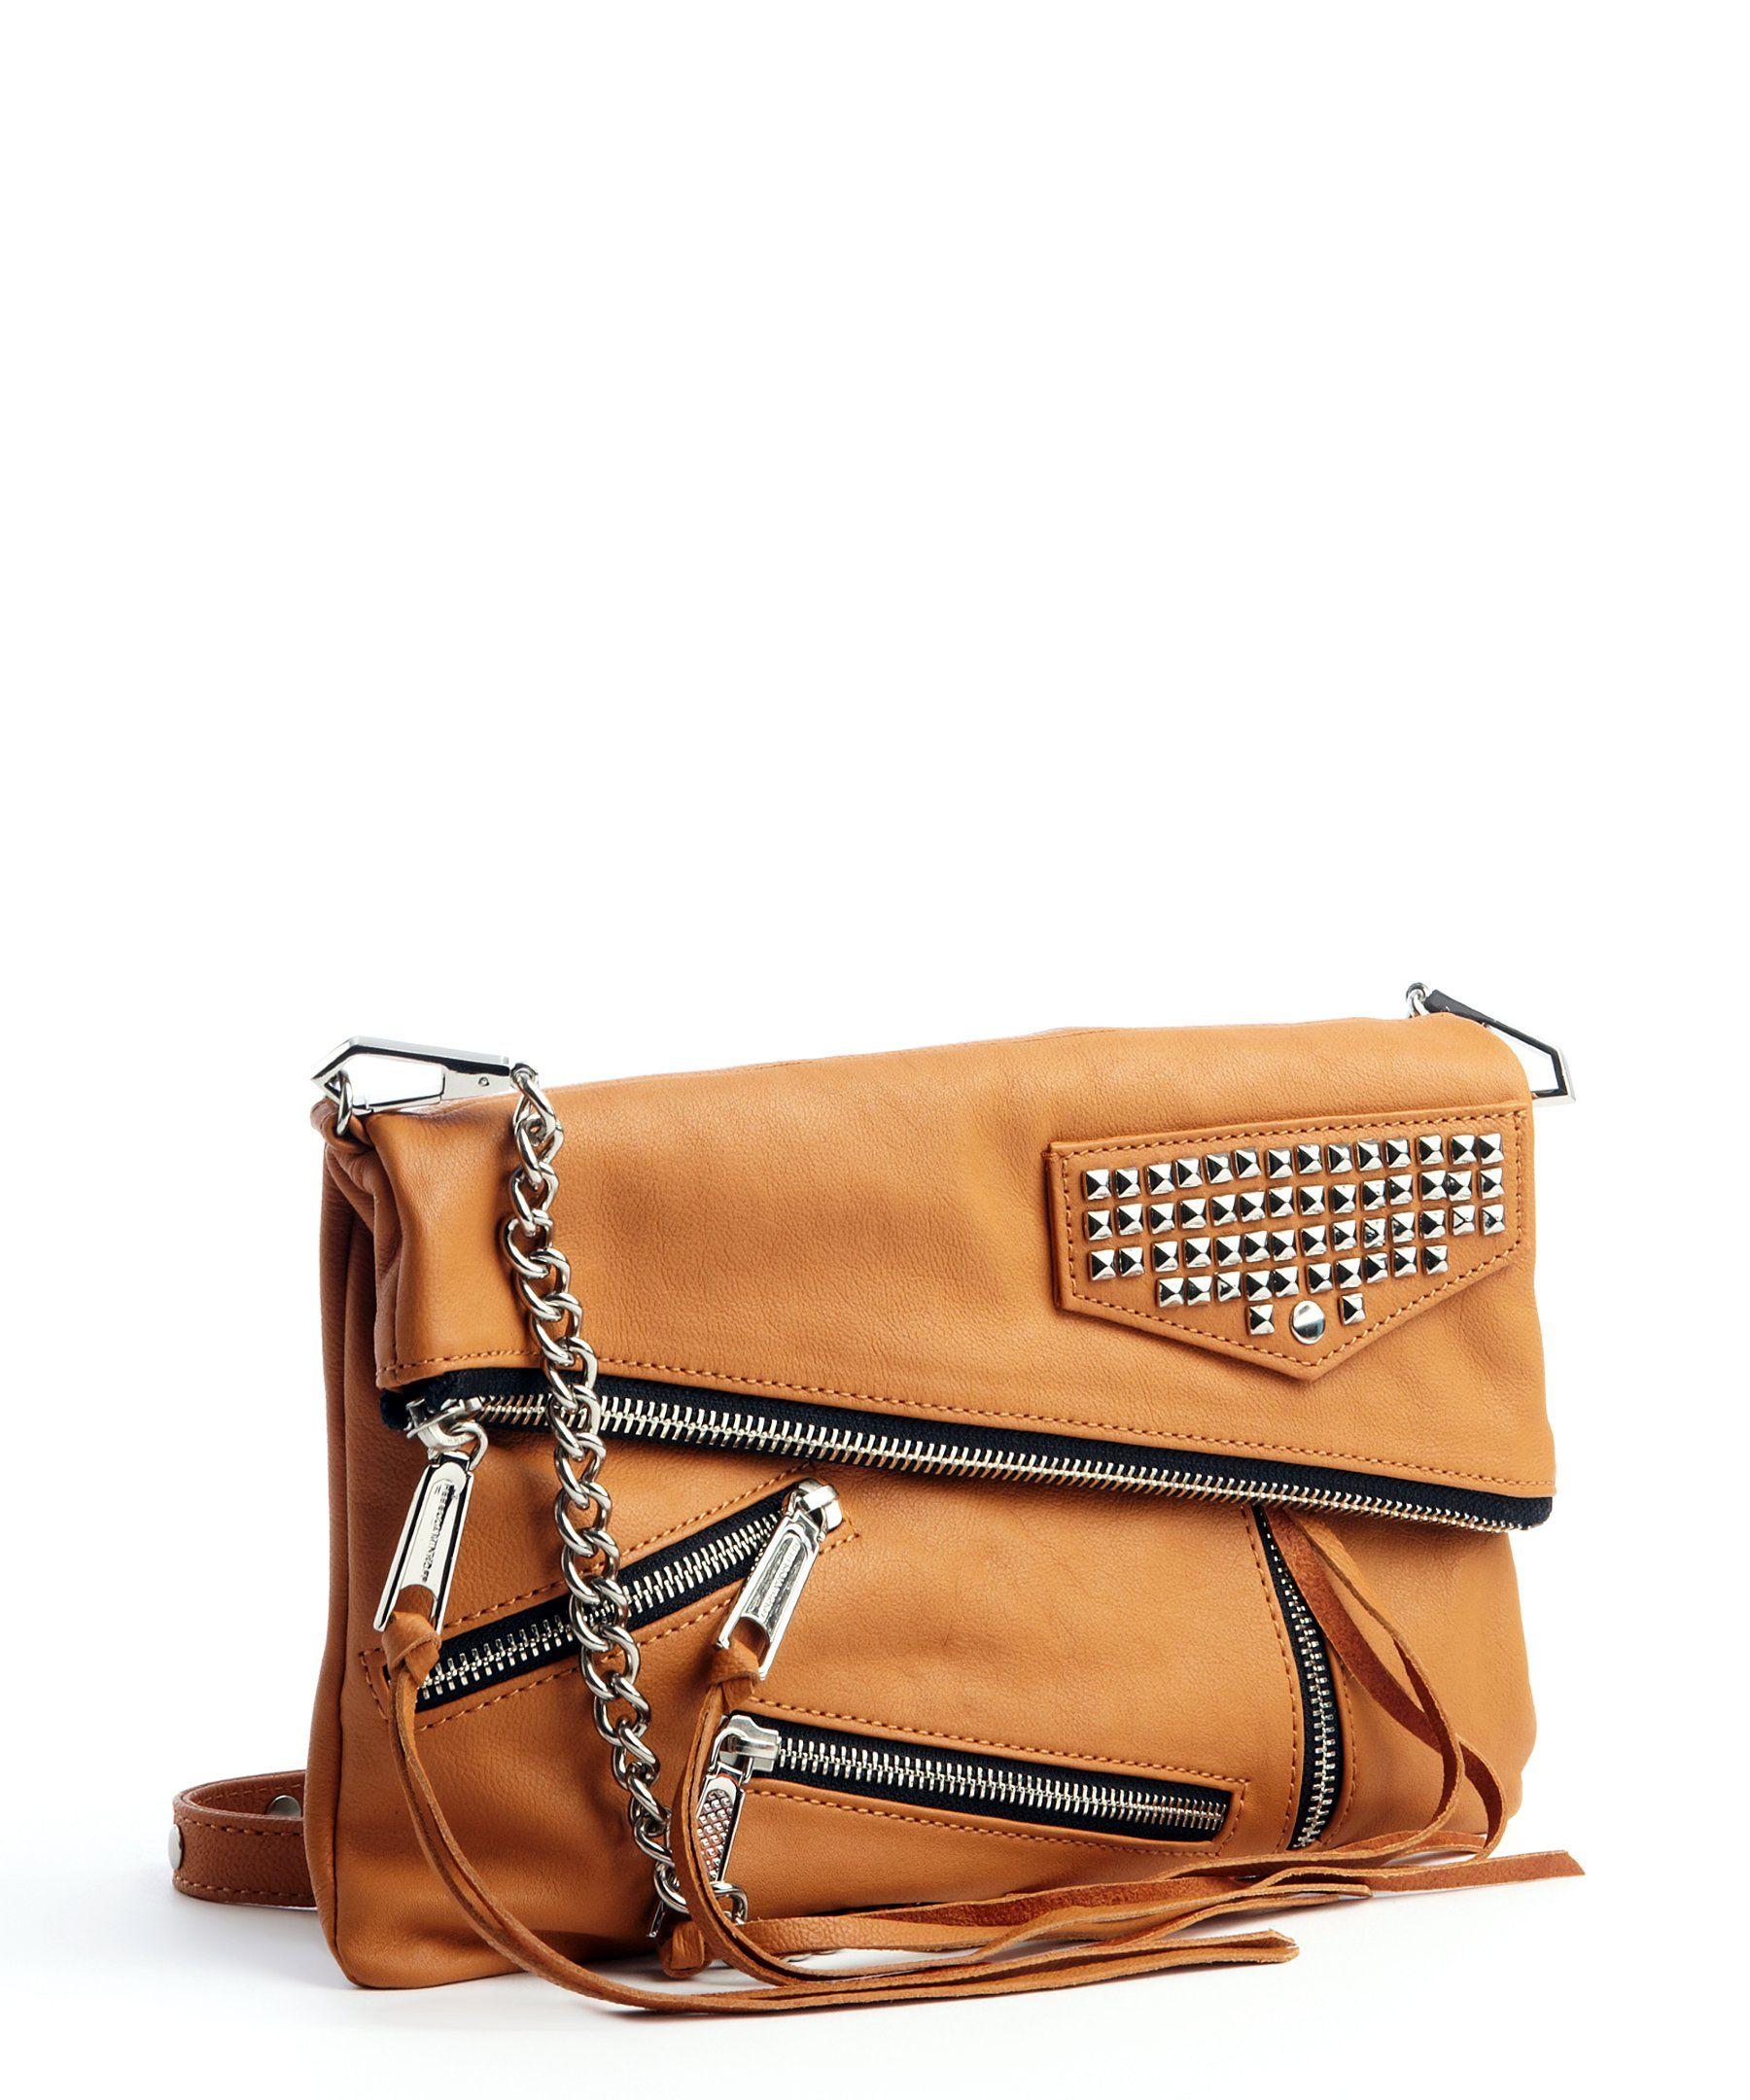 7d25adaf87 Rebecca Minkoff almond studded  Harper  crossbody bag